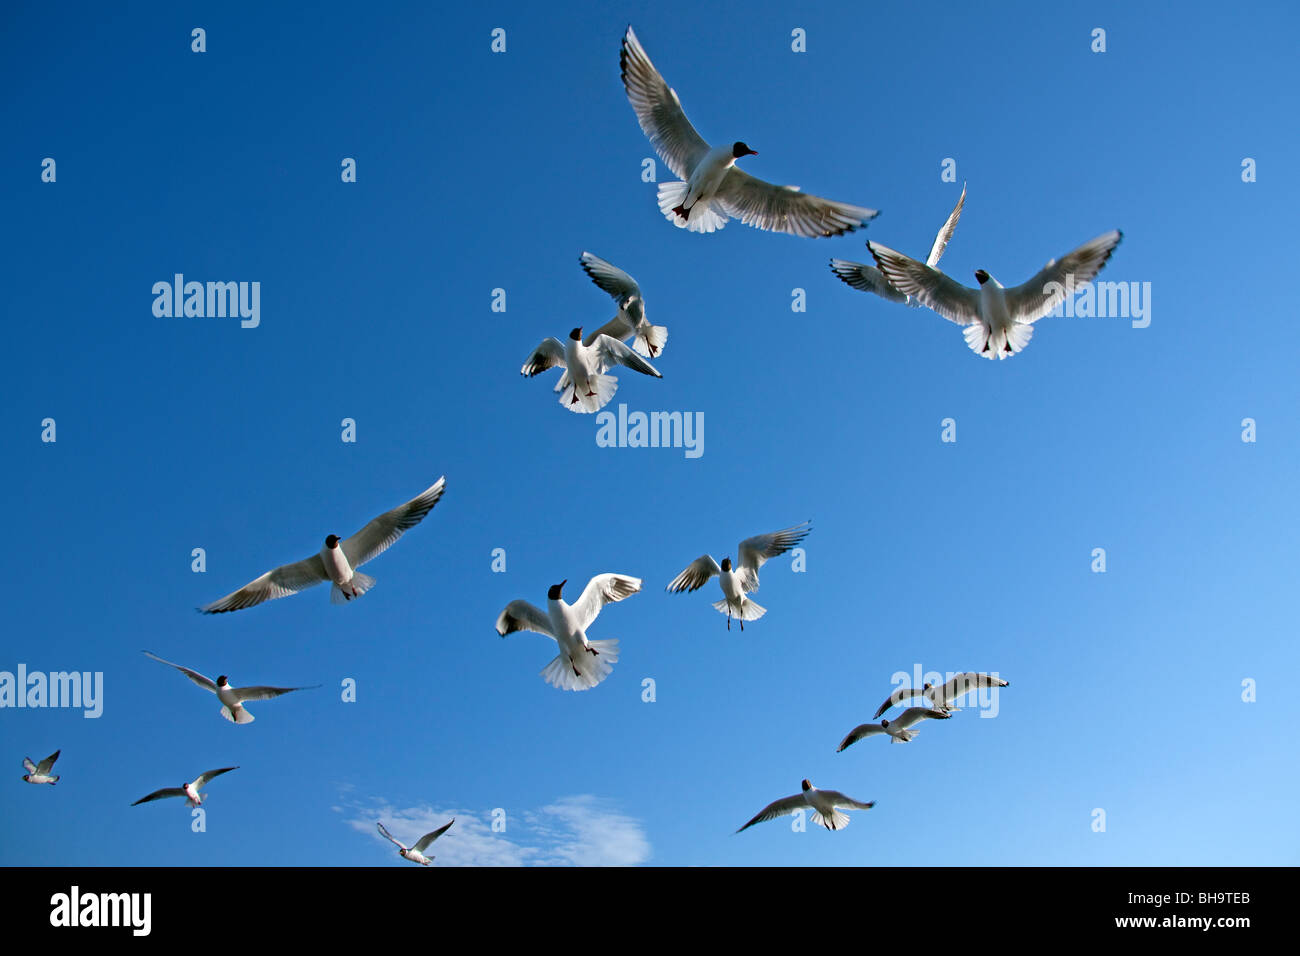 Flock of Black-headed gulls (Larus ridibundus) in flight, Germany - Stock Image